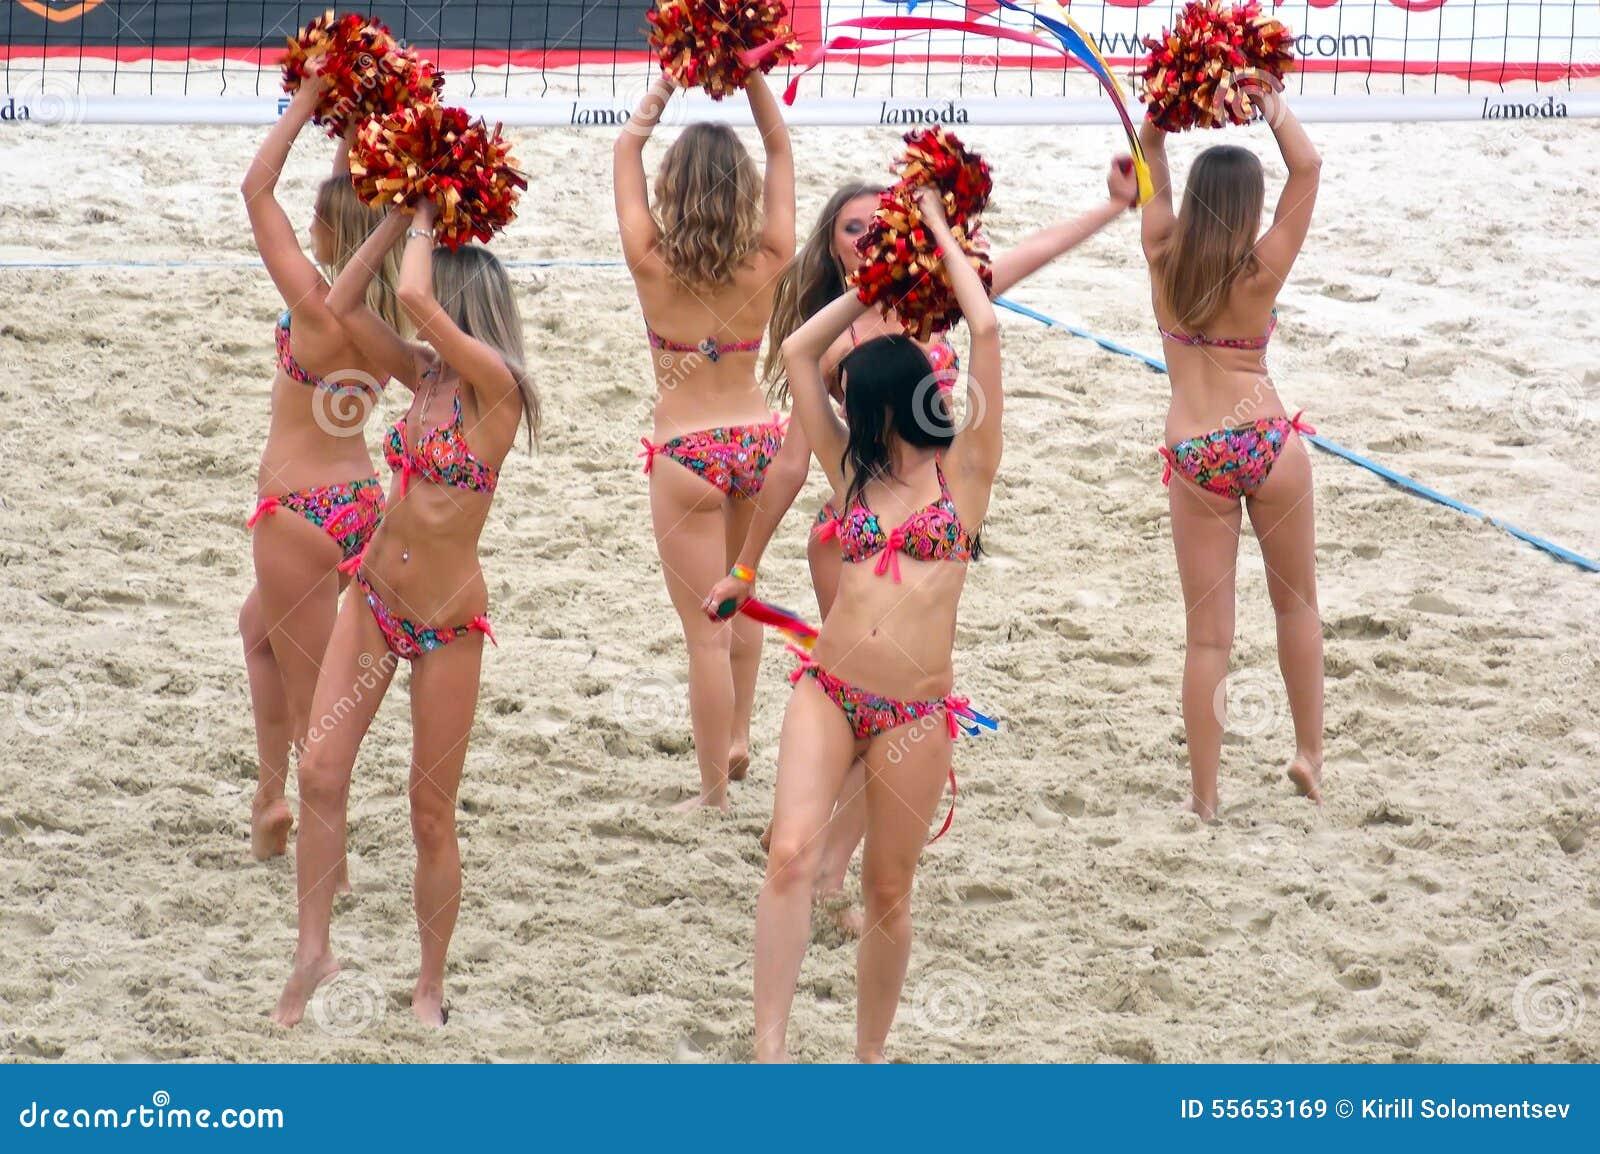 sexy beach volleyball song clip